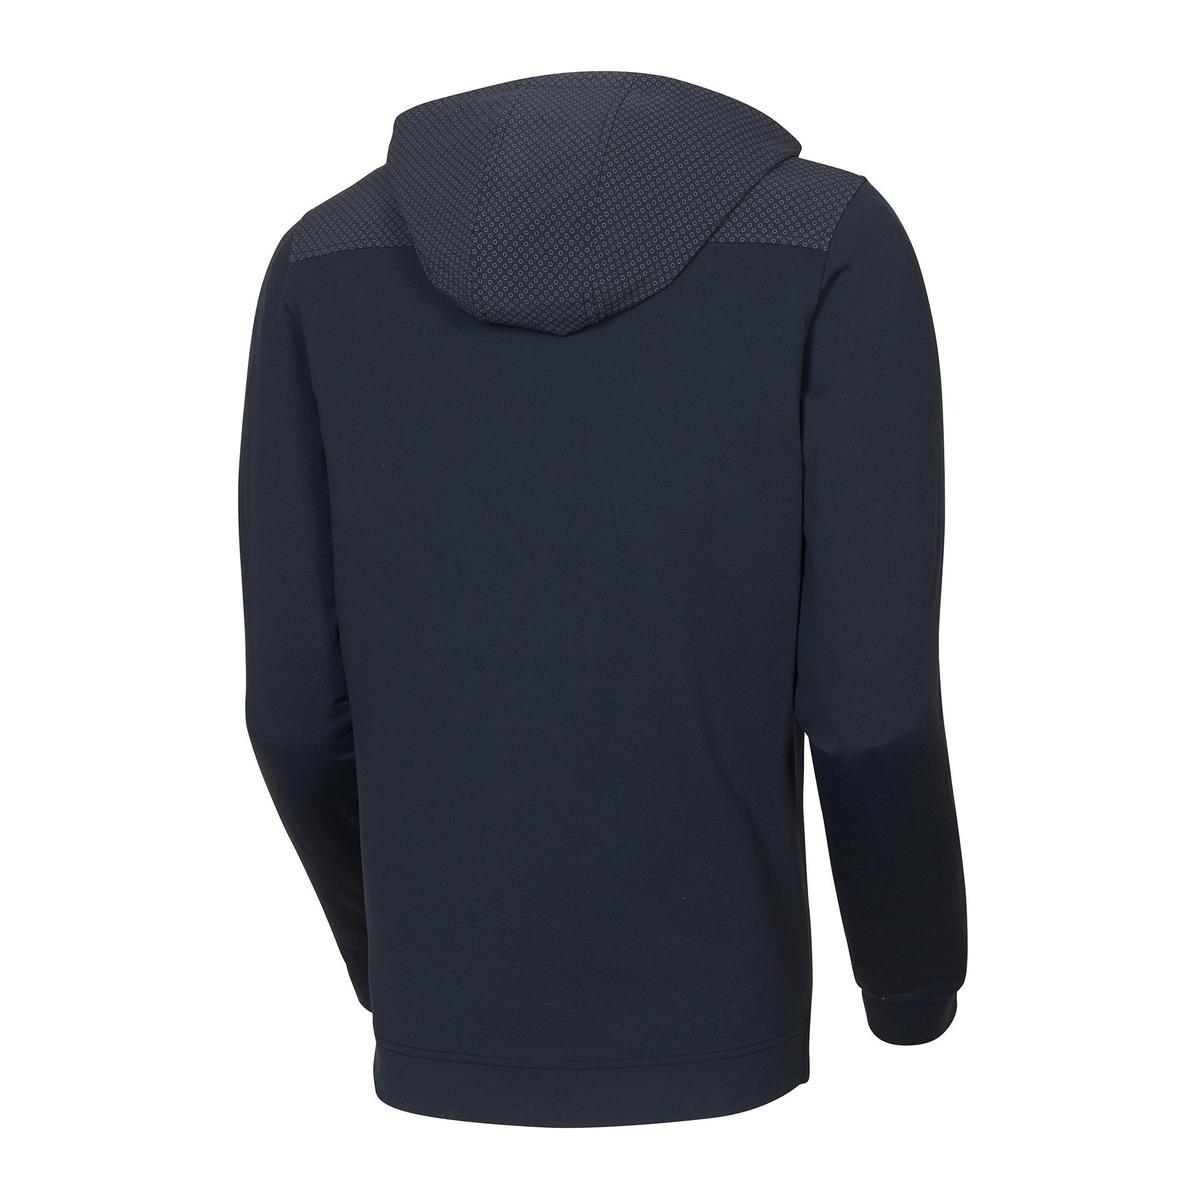 Printed Woven Yoke Half-Zip Hoodie-Previous Season Style